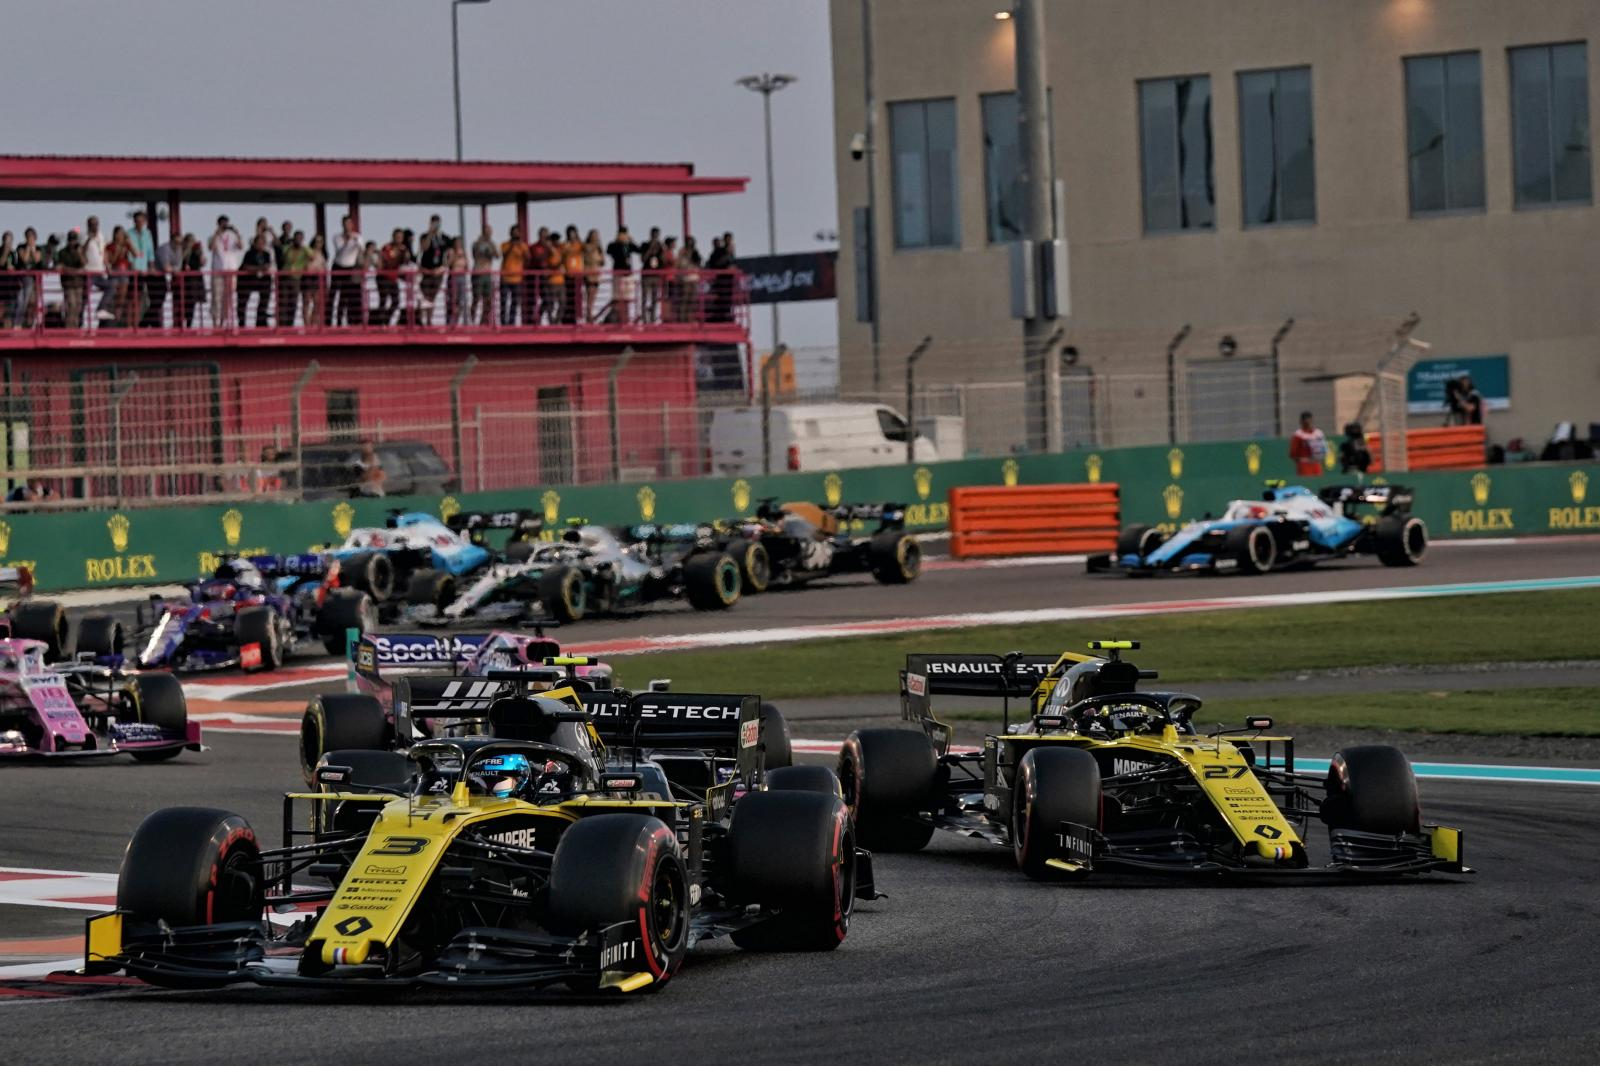 21237056 2019 - Grand Prix de Formule 1 d Abu Dhabi